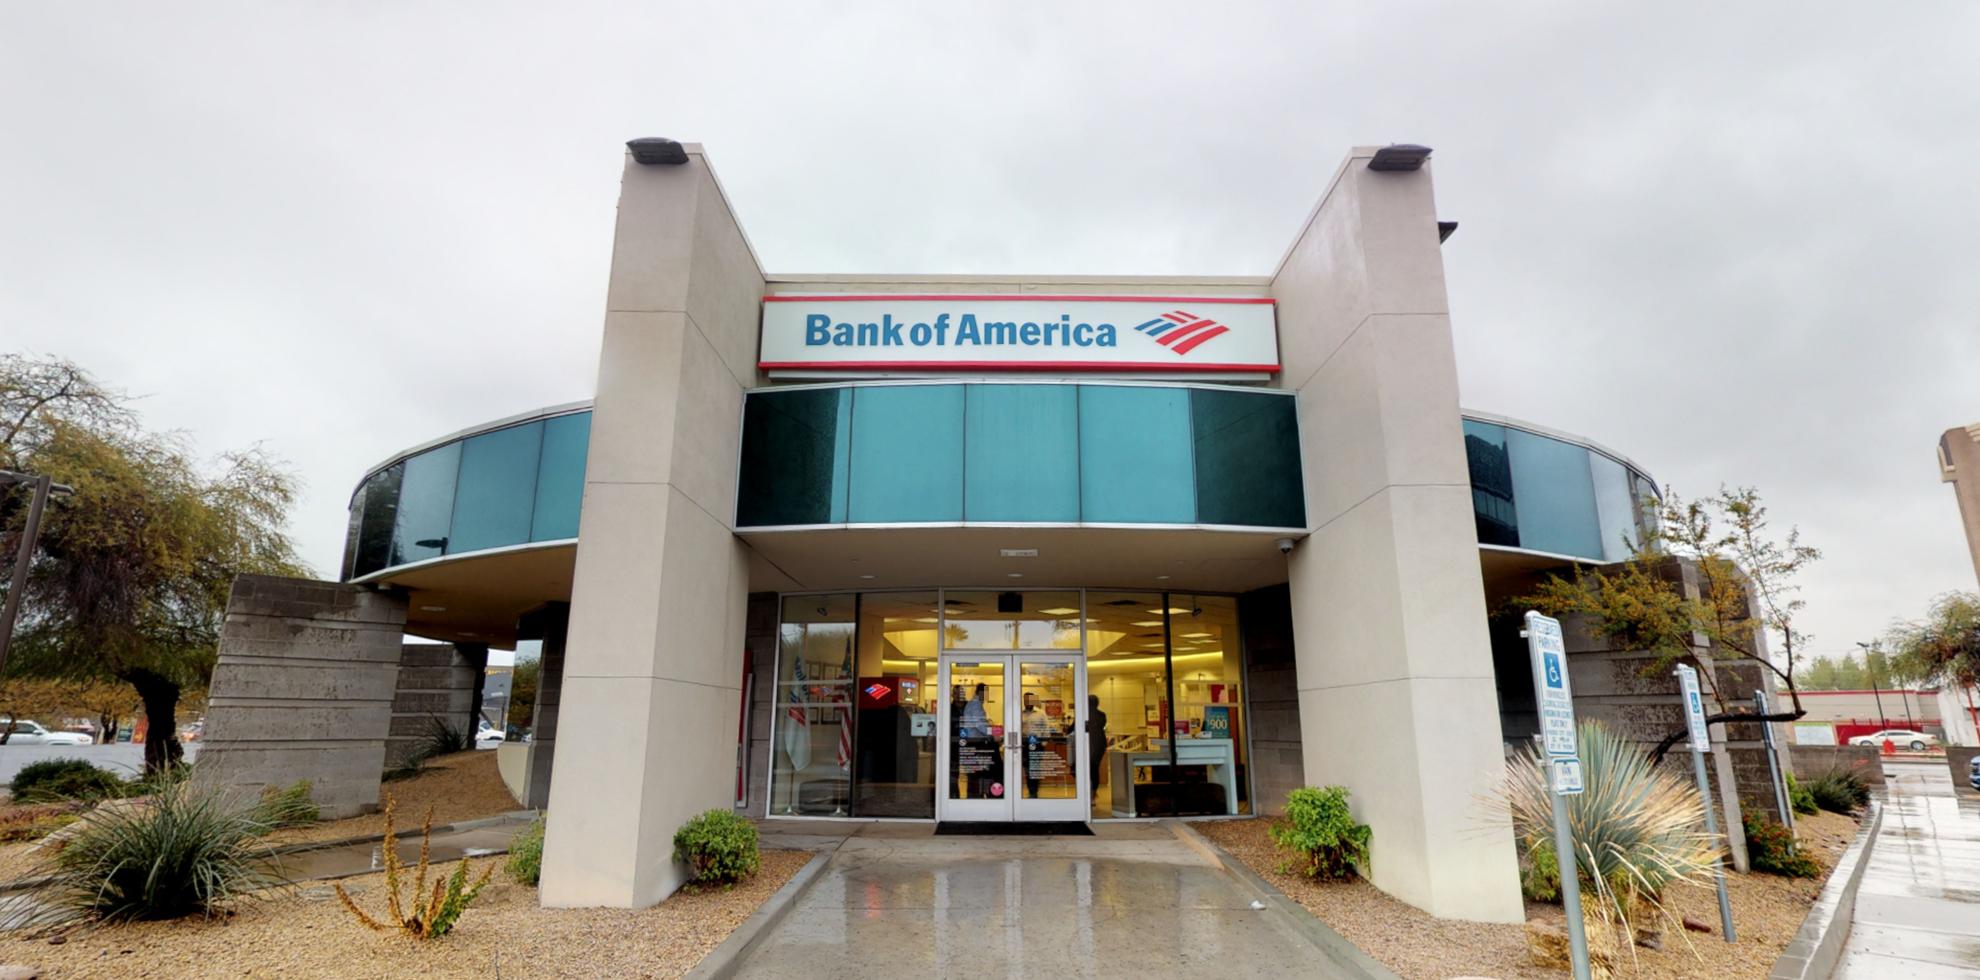 Bank of America financial center with drive-thru ATM | 2902 N 44th St, Phoenix, AZ 85018